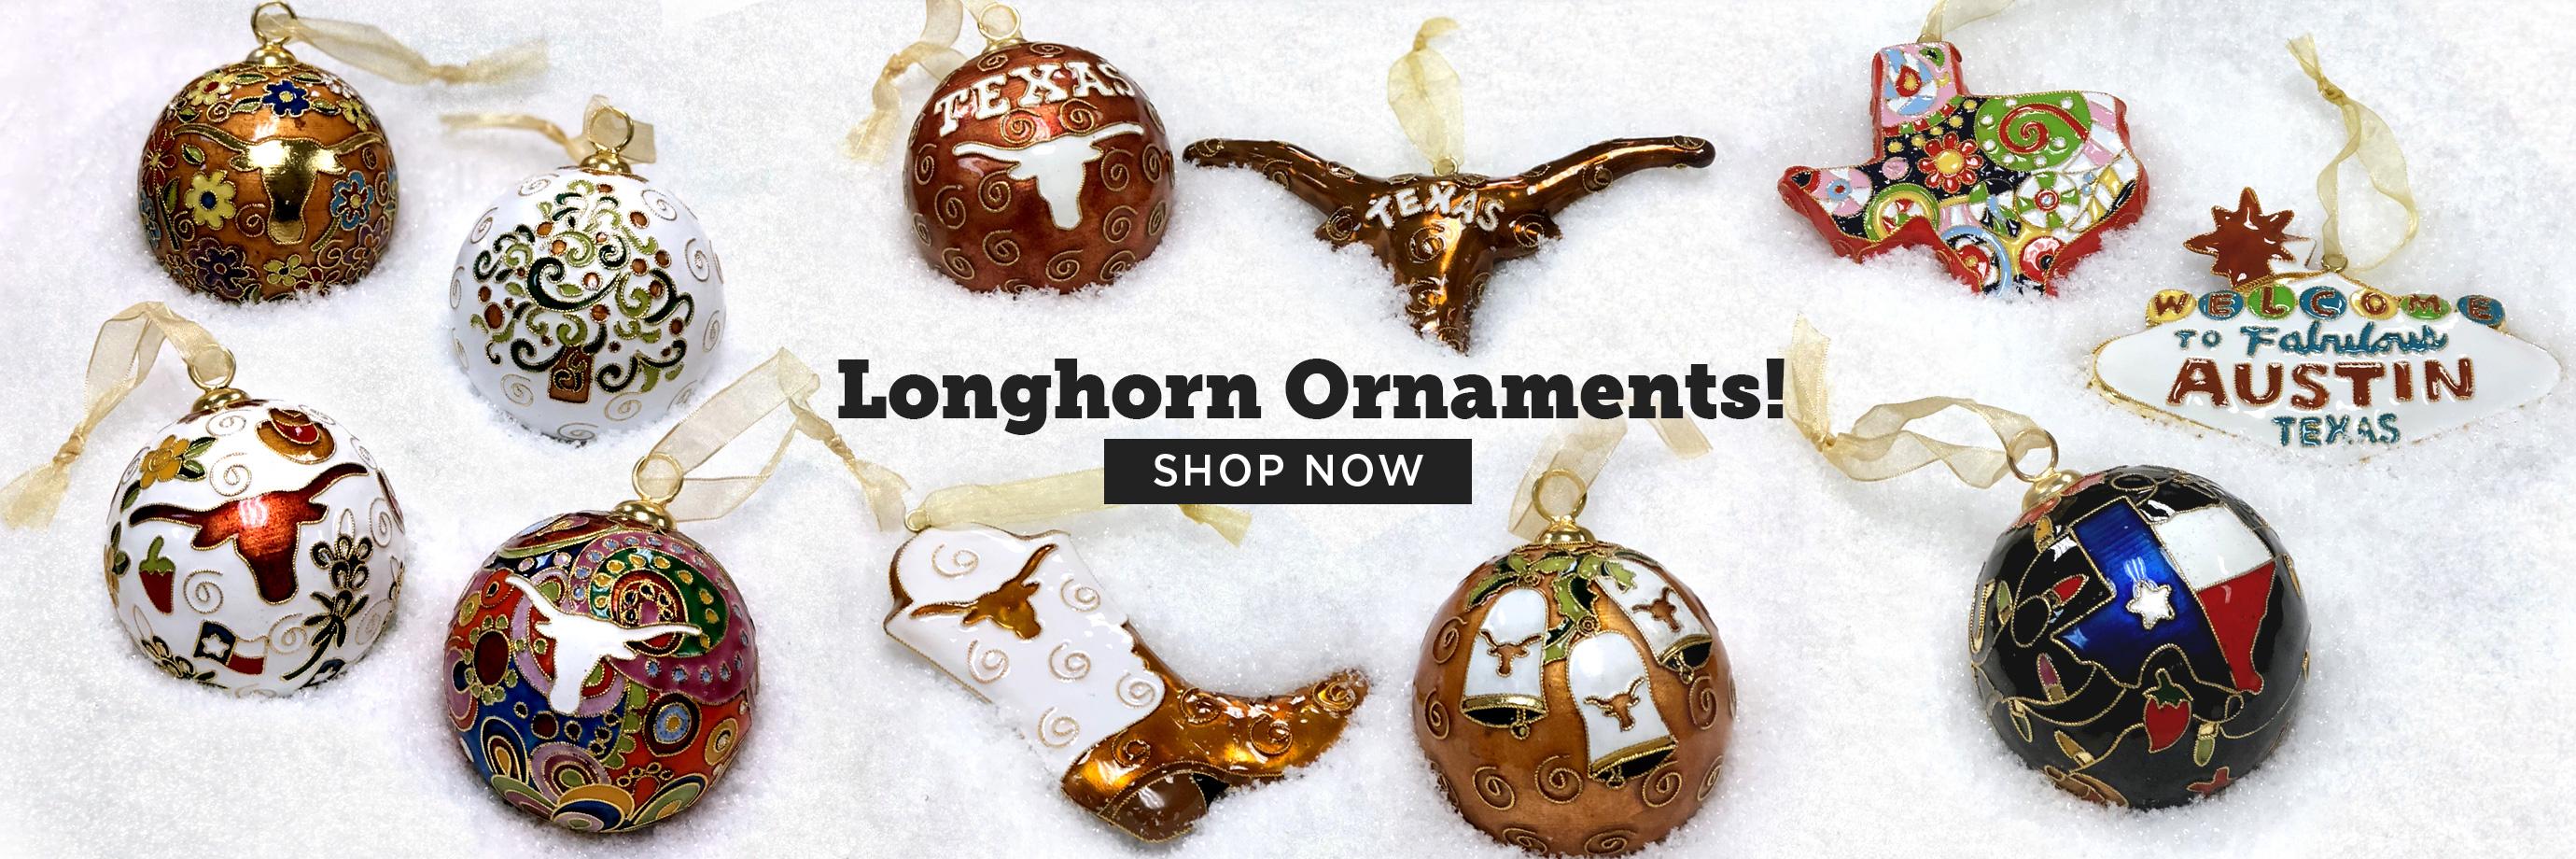 Longhorn Ornaments